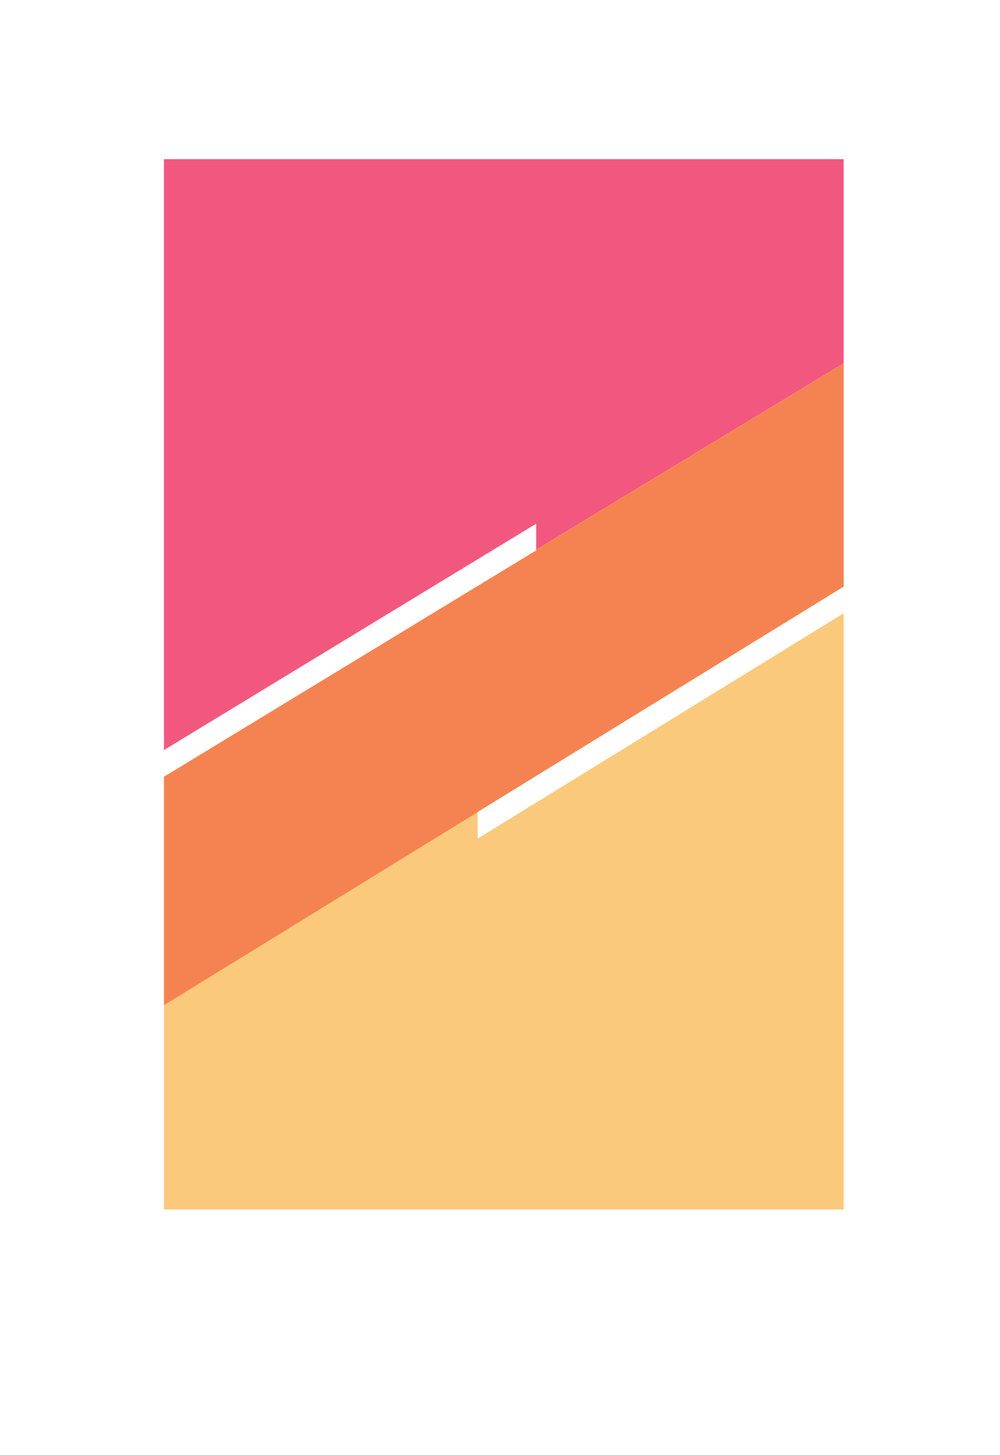 knitcon_alpha26.jpg